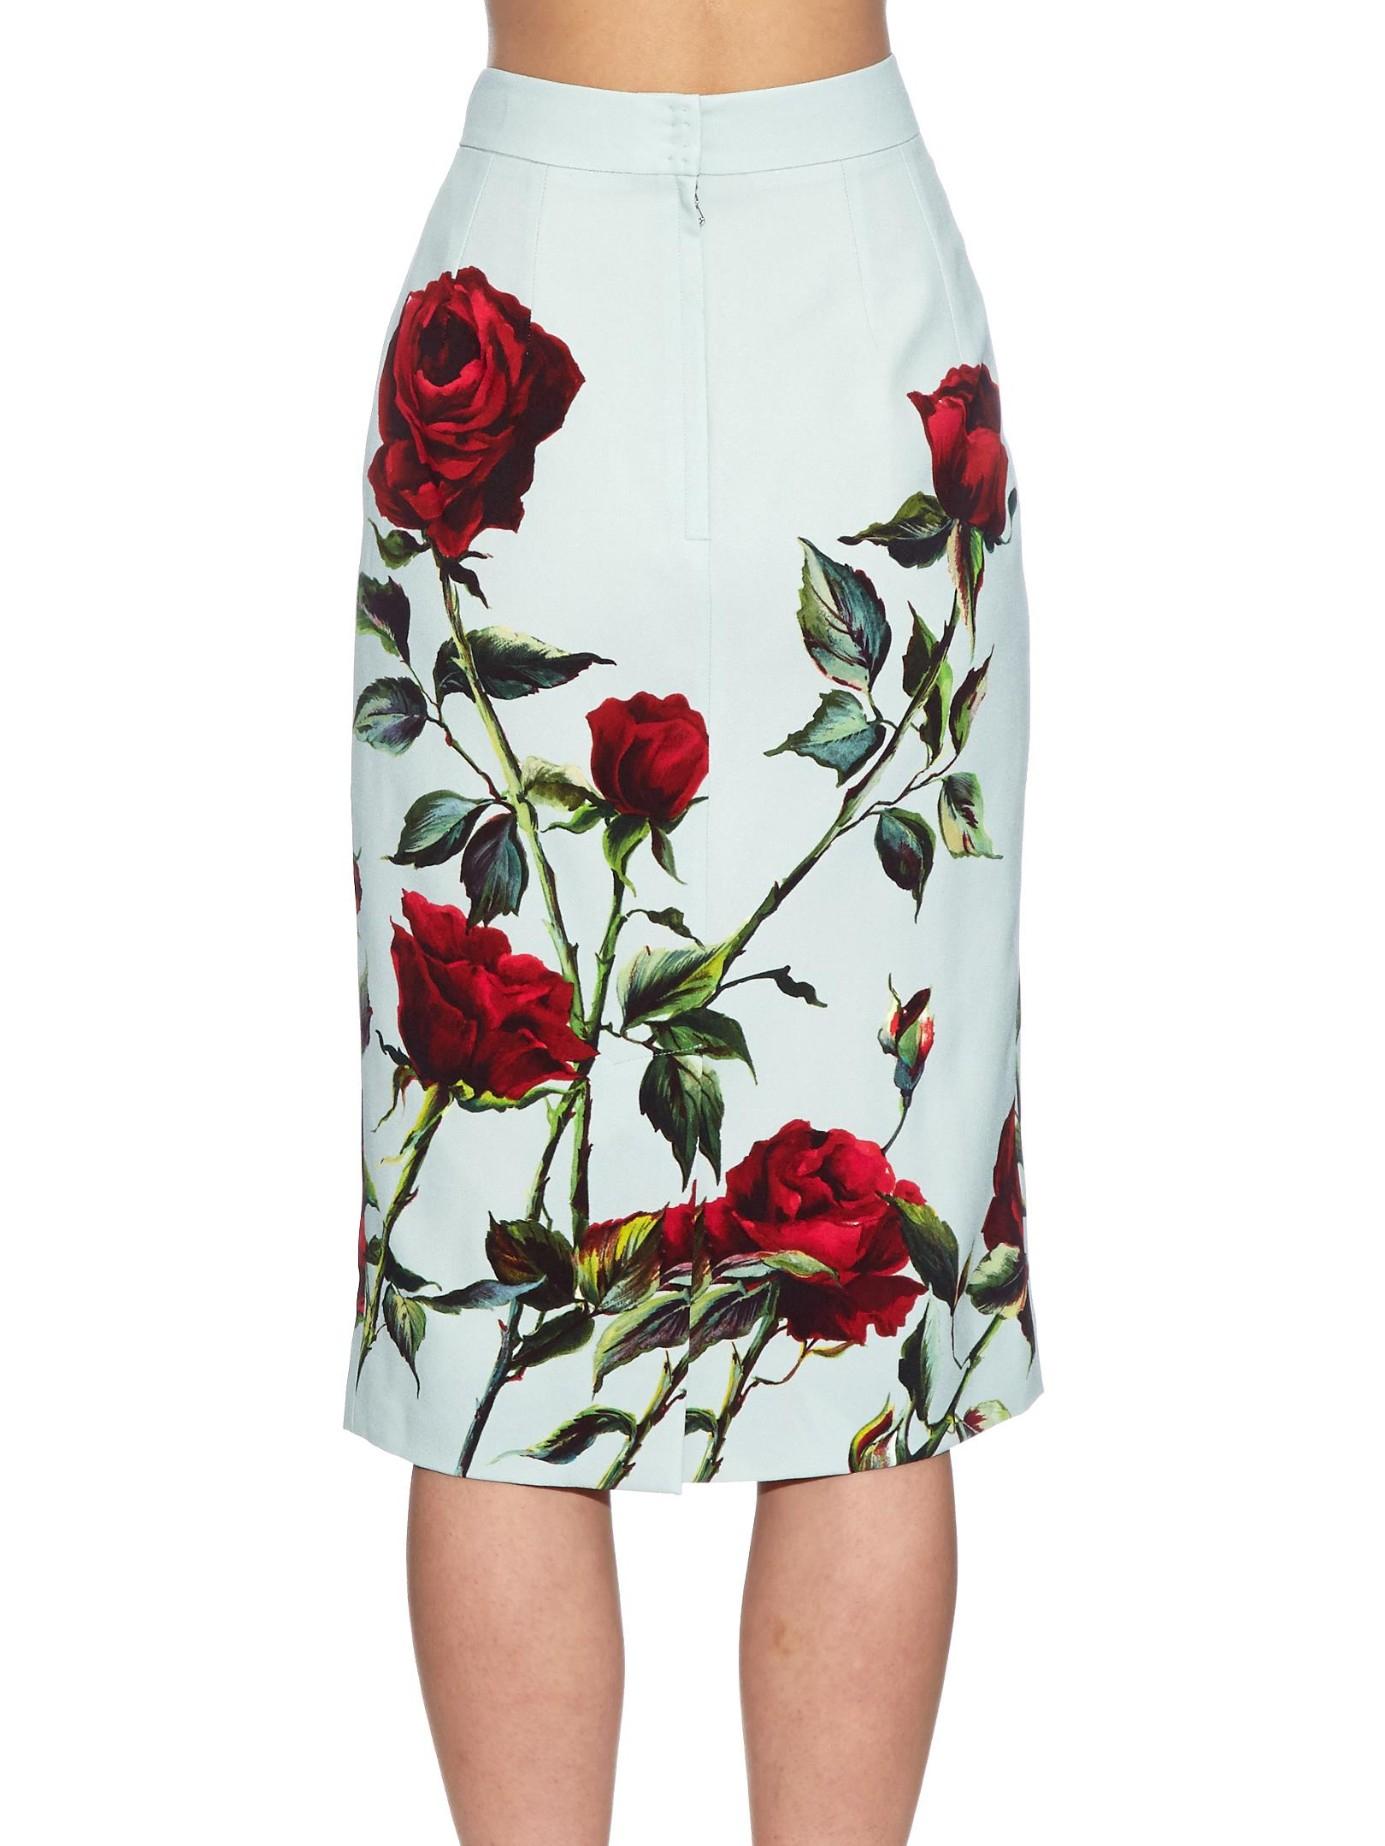 d4071ba7a Dolce & Gabbana Rose-Print Cady Pencil Skirt in Green - Lyst